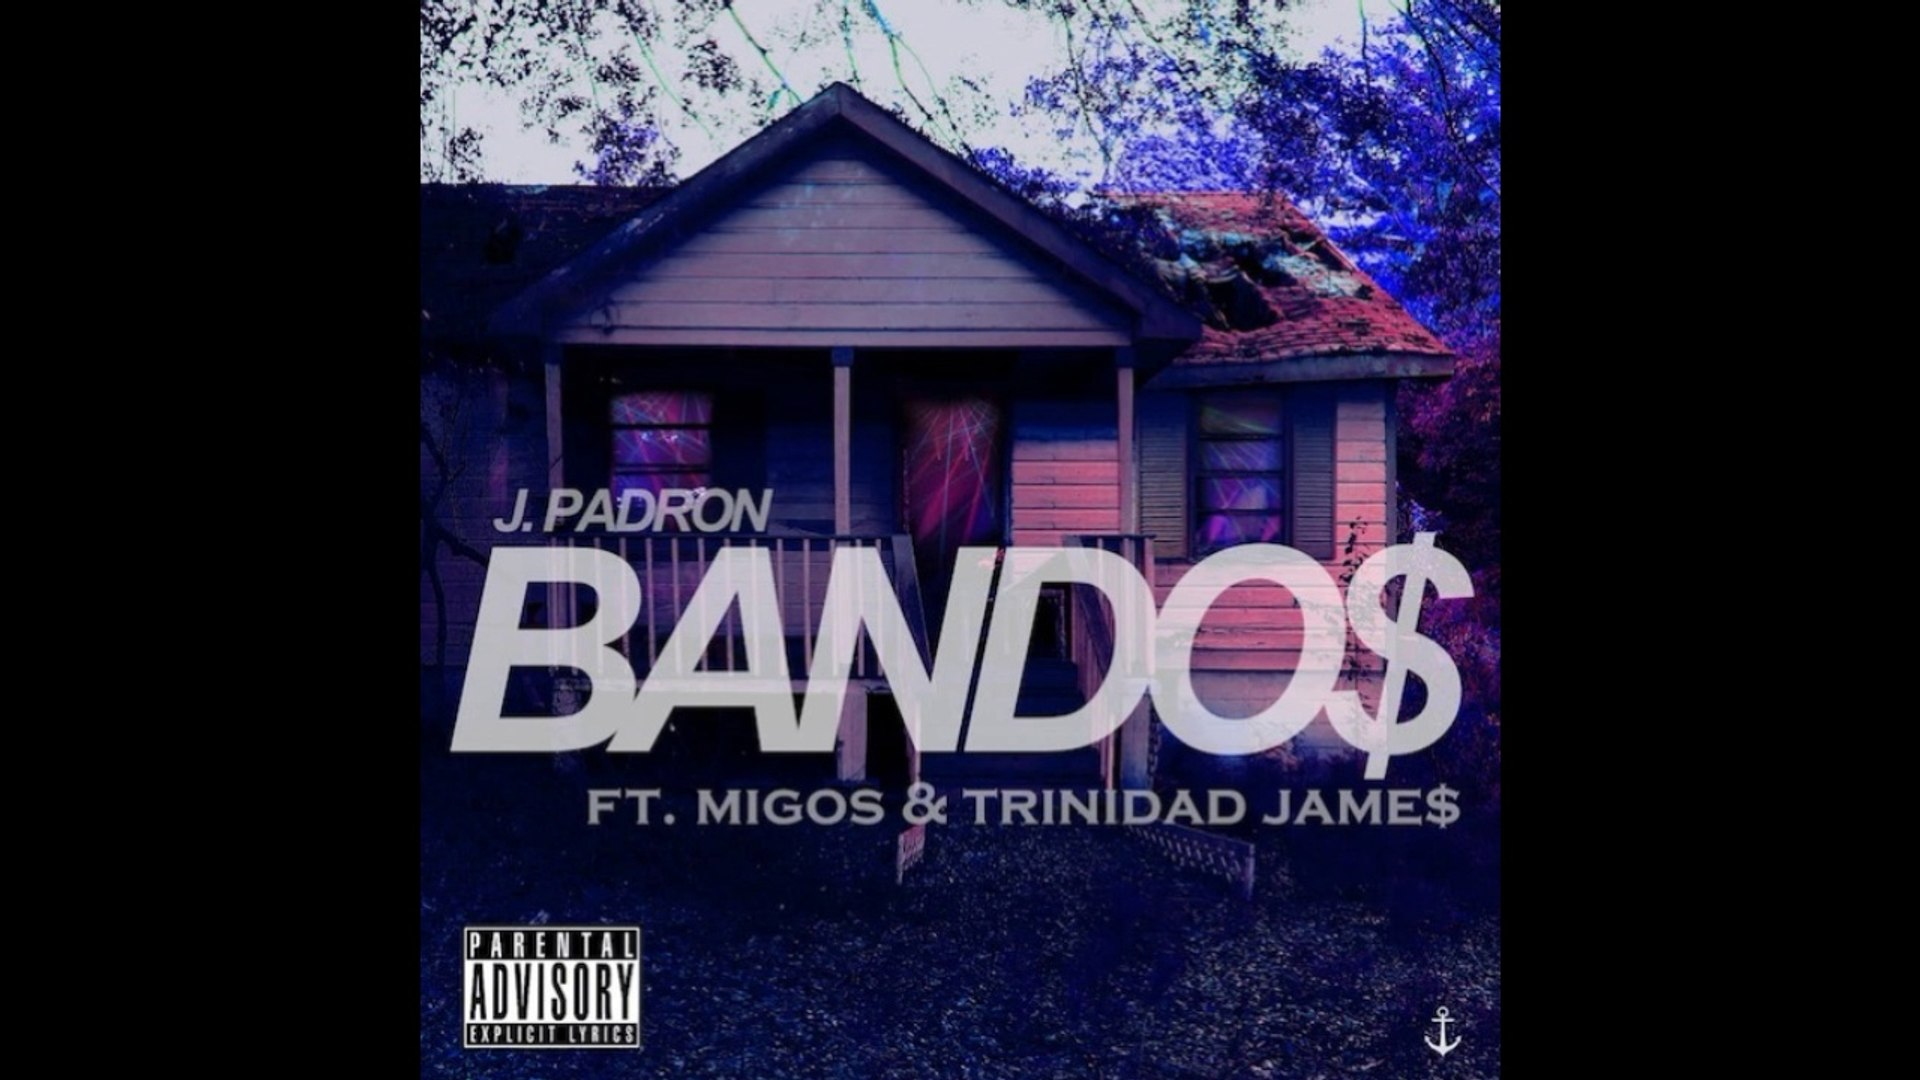 J. PADRON ft MIGOS & TRINIDAD JAMES